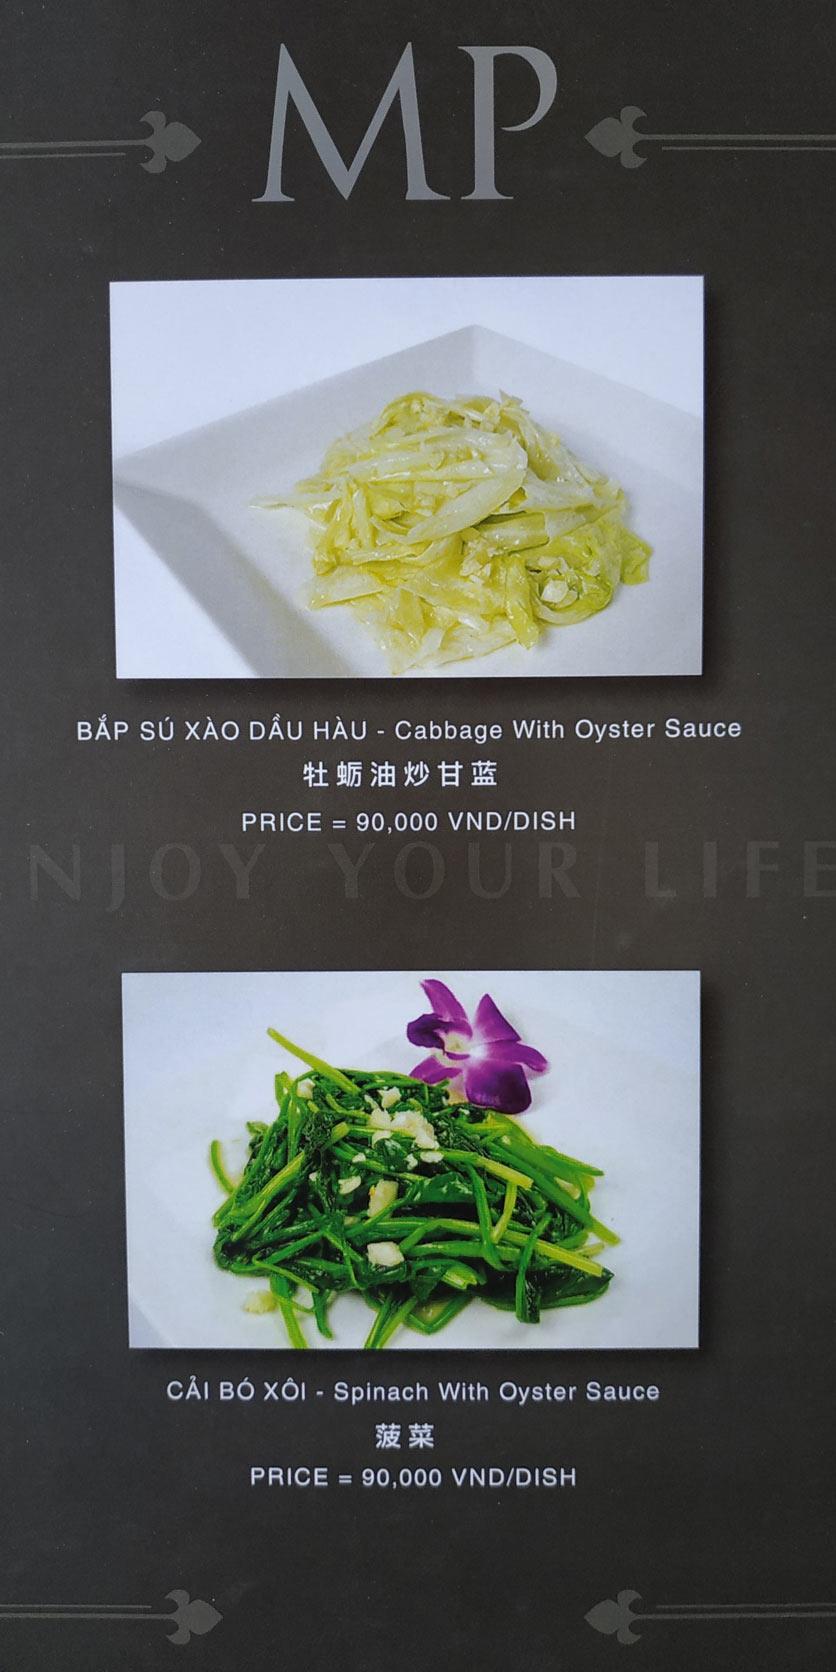 Menu MP Thai Seafood Restaurant - Phạm Văn Đồng 15